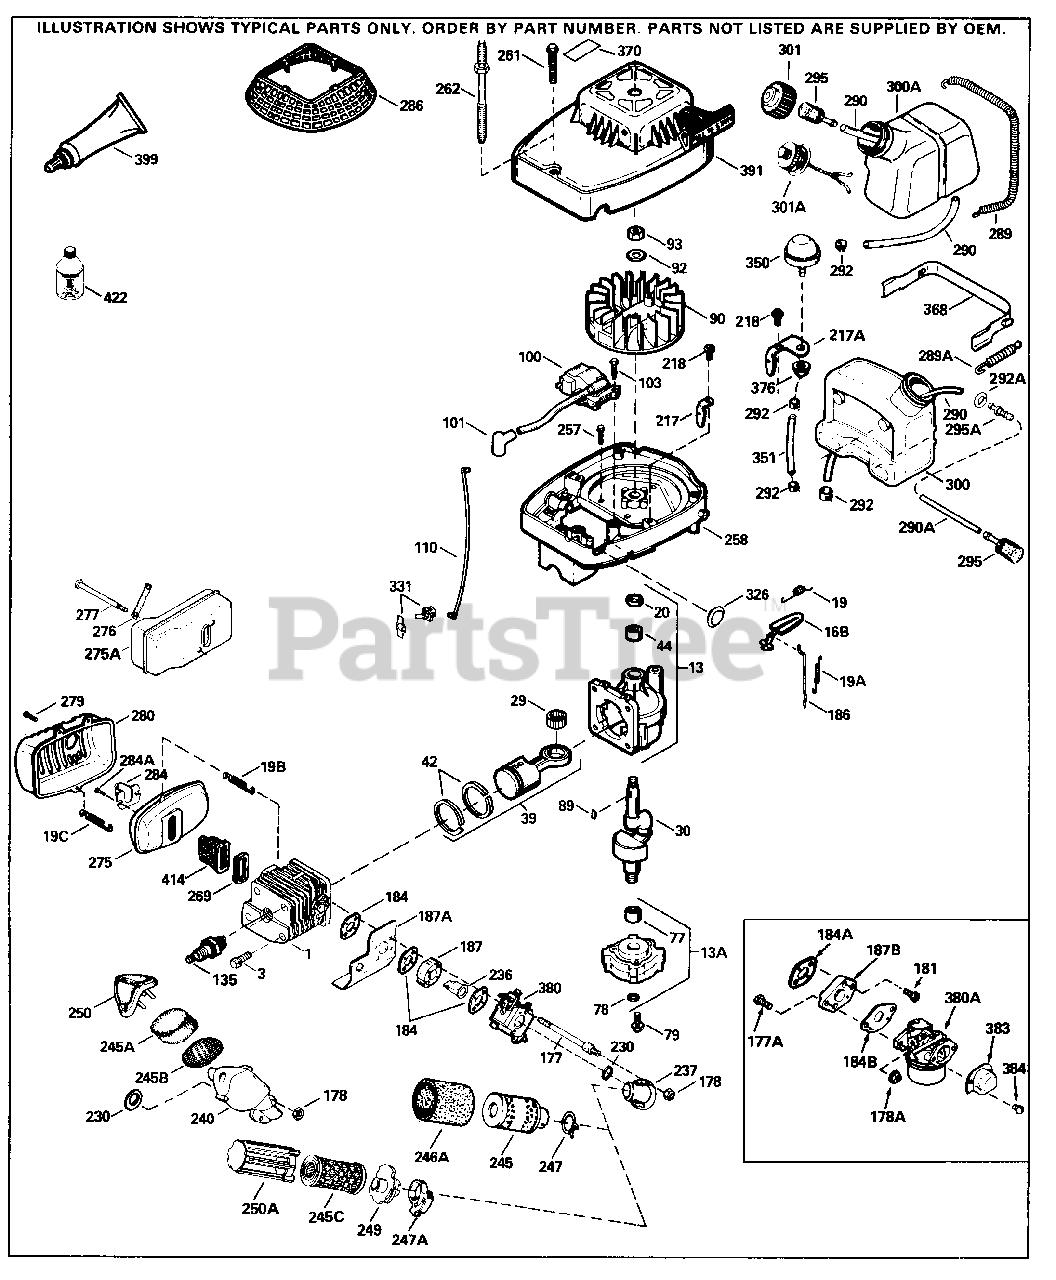 Tecumseh TC300-3004A - Tecumseh Engine Engine Parts List Parts Lookup with  Diagrams | PartsTreePartsTree